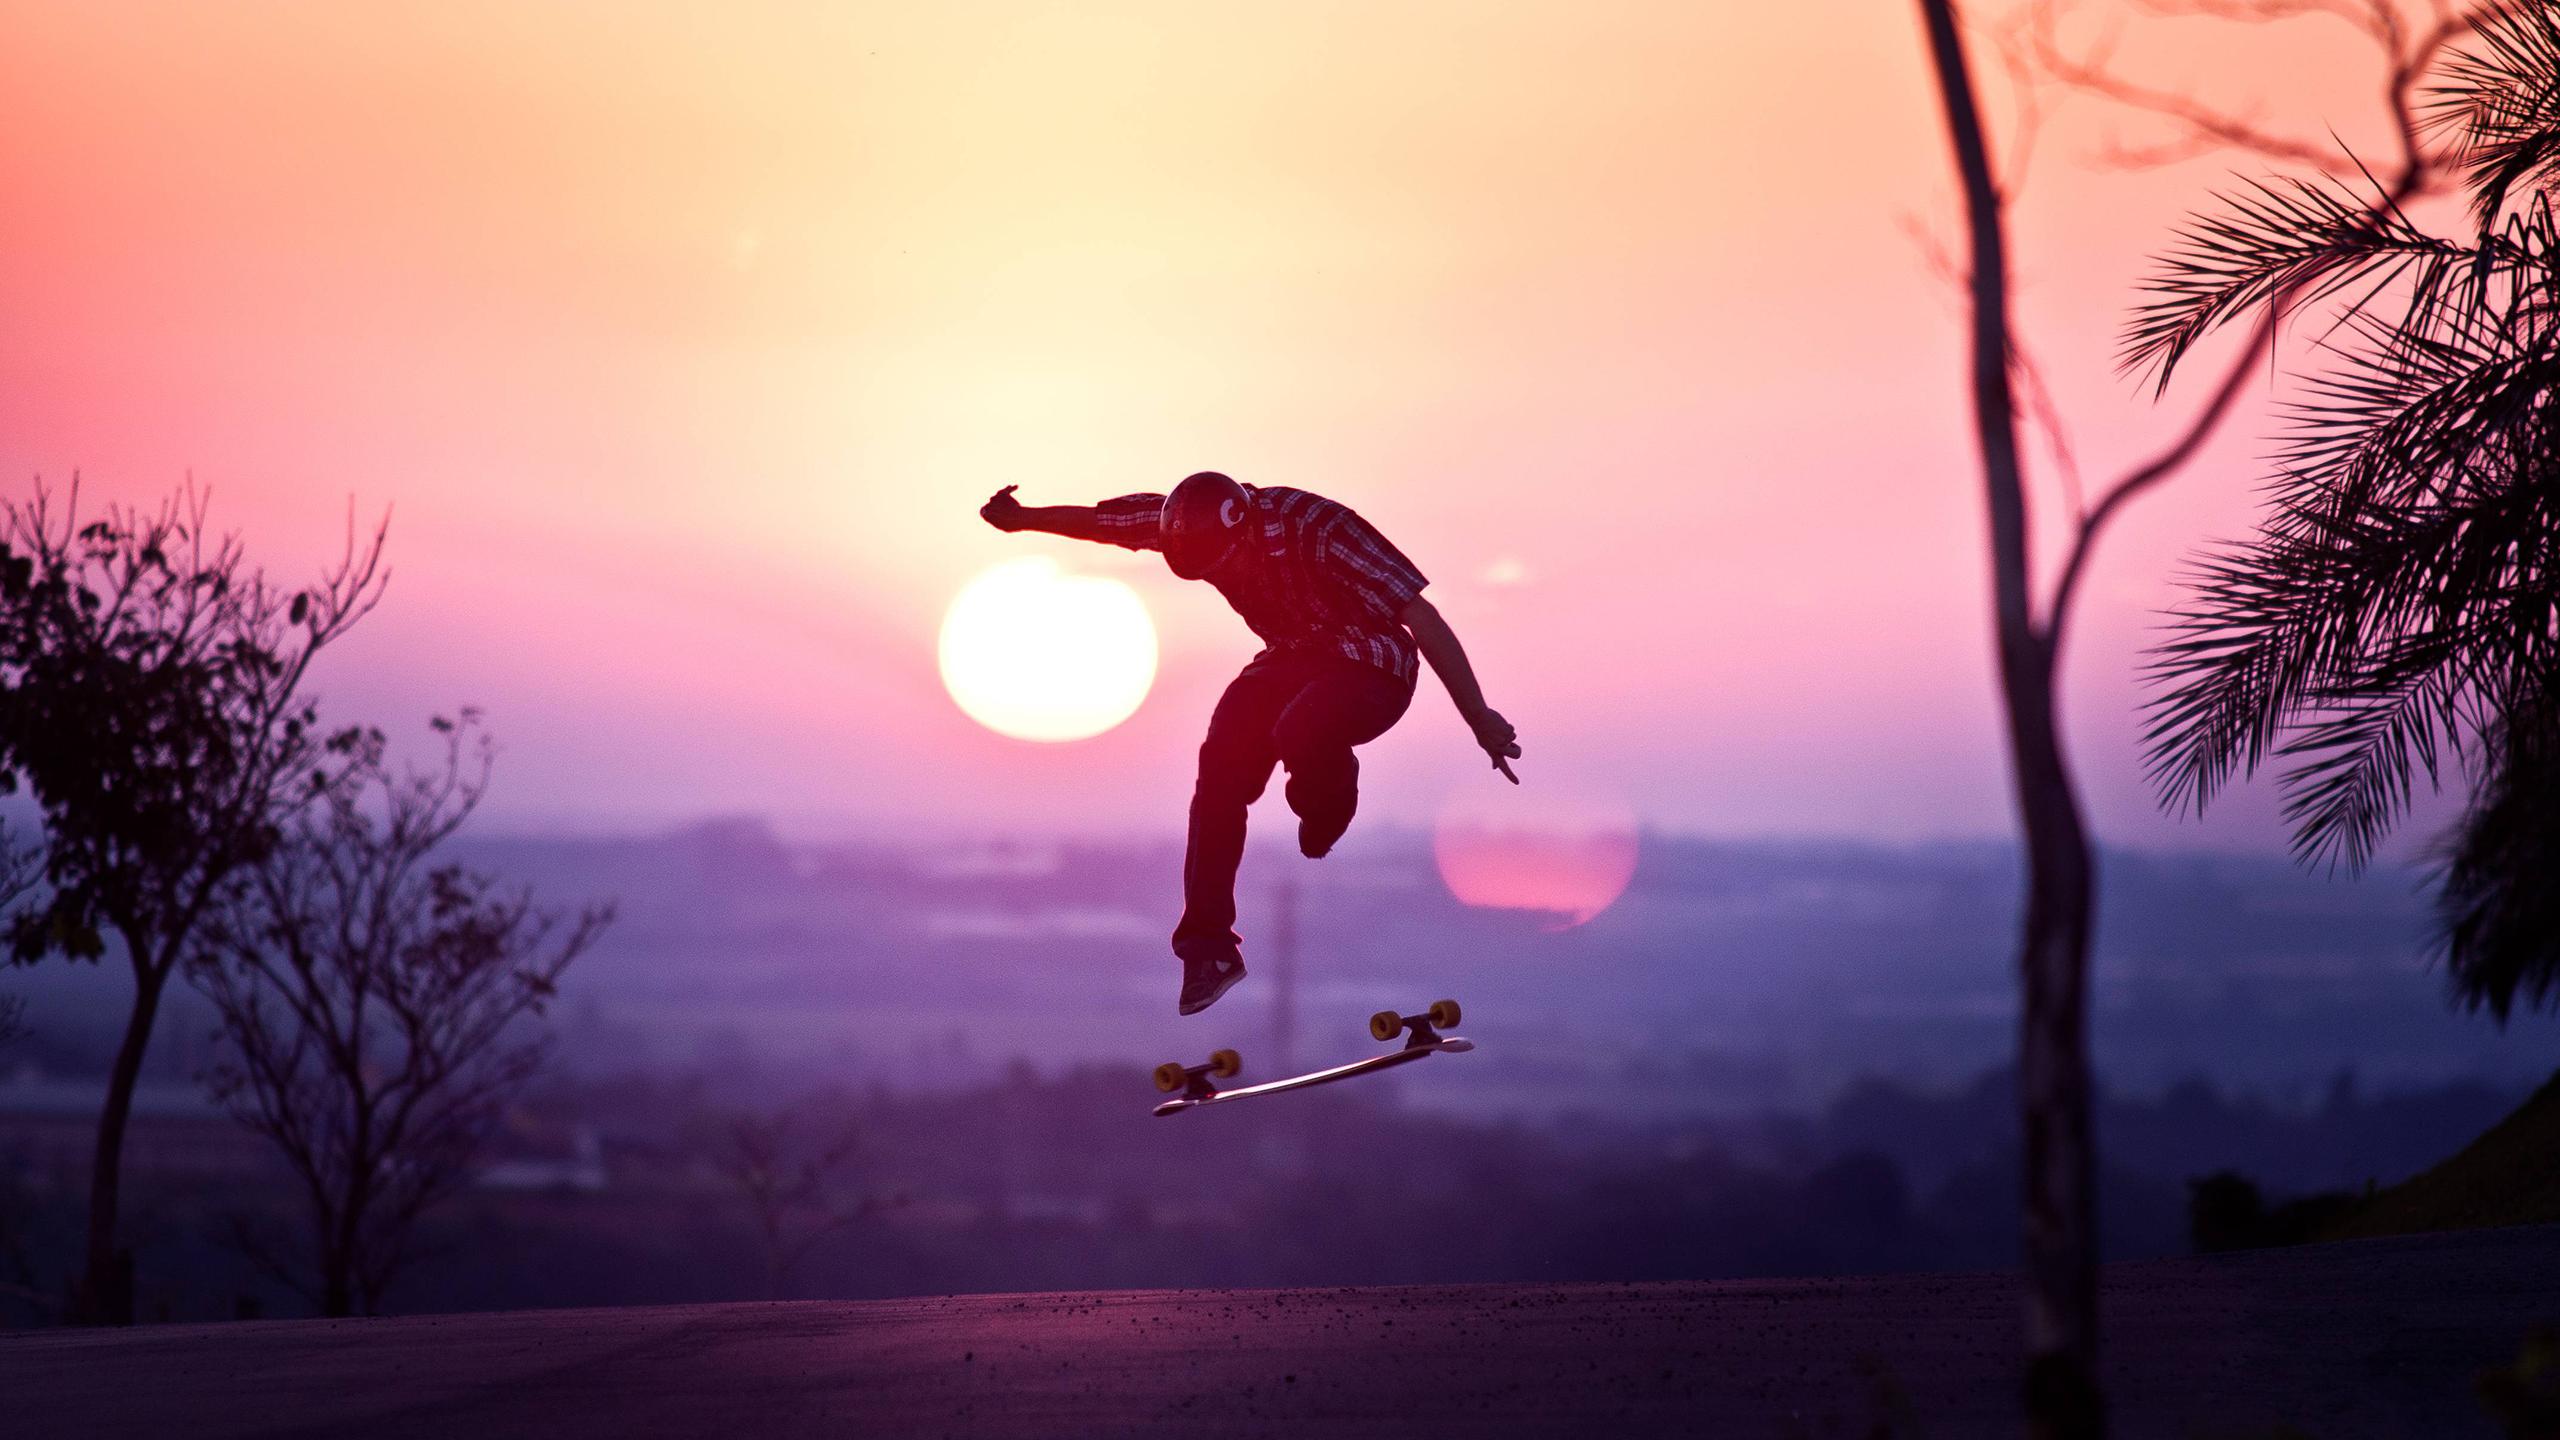 Skateboard Wallpapers   Top Skateboard Backgrounds 2560x1440